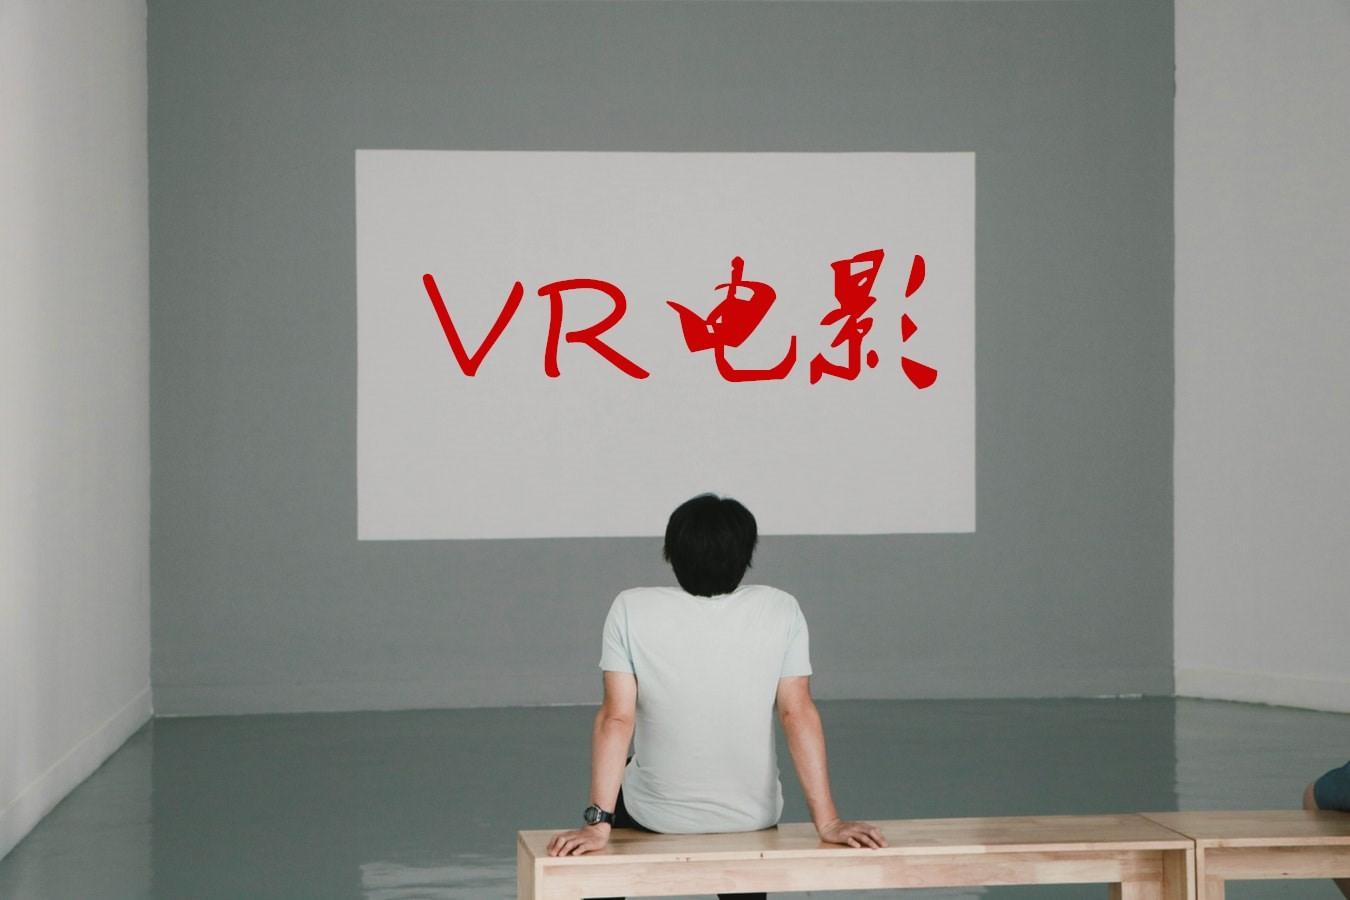 VR电影:肩负着3D未完成的使命